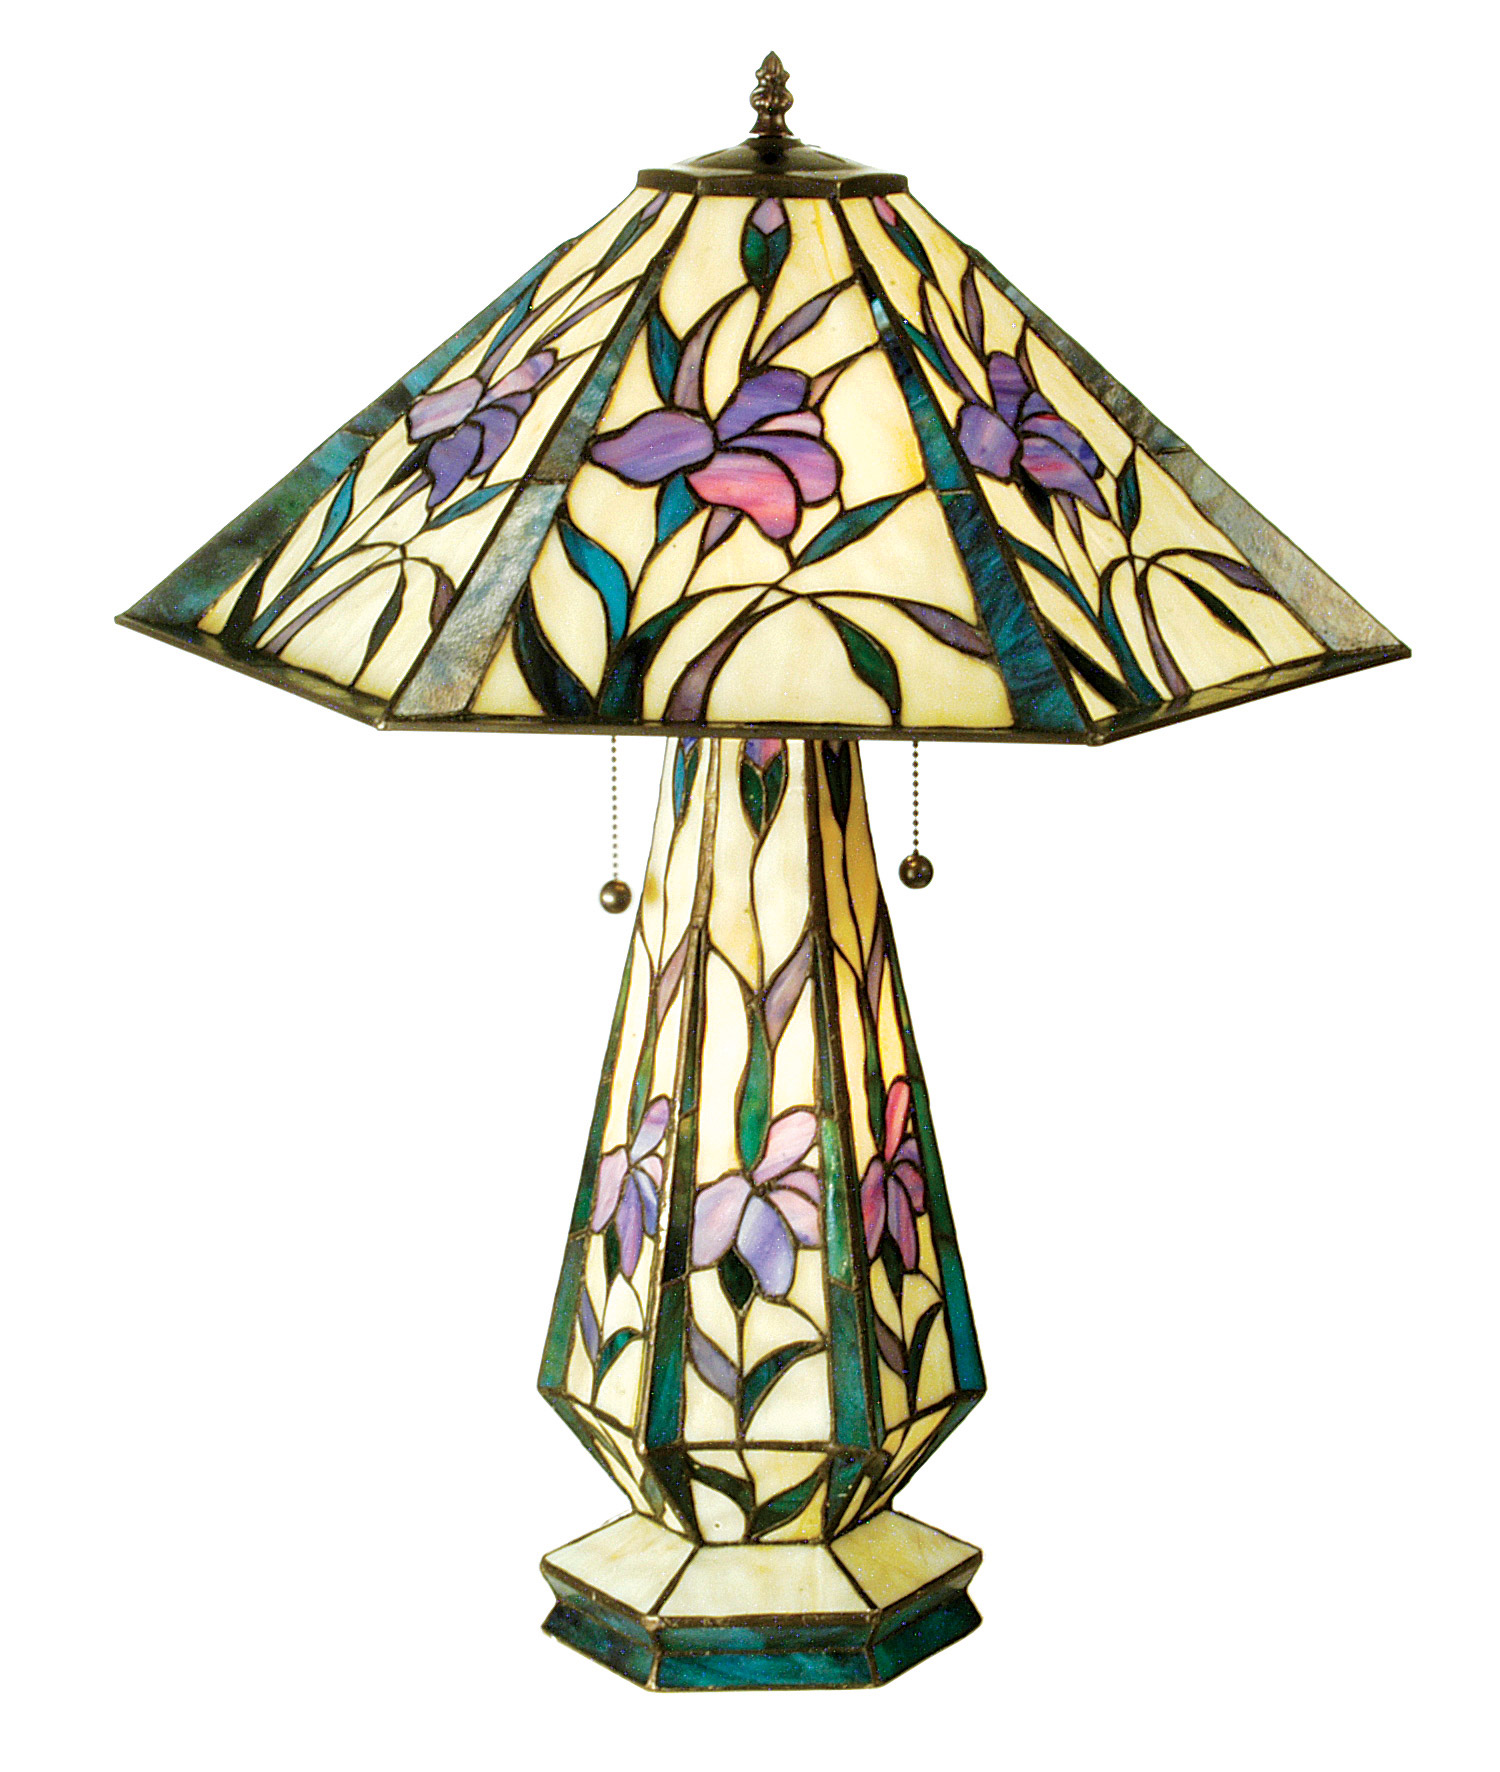 Meyda 50808 Tiffany Iris Table Lamp